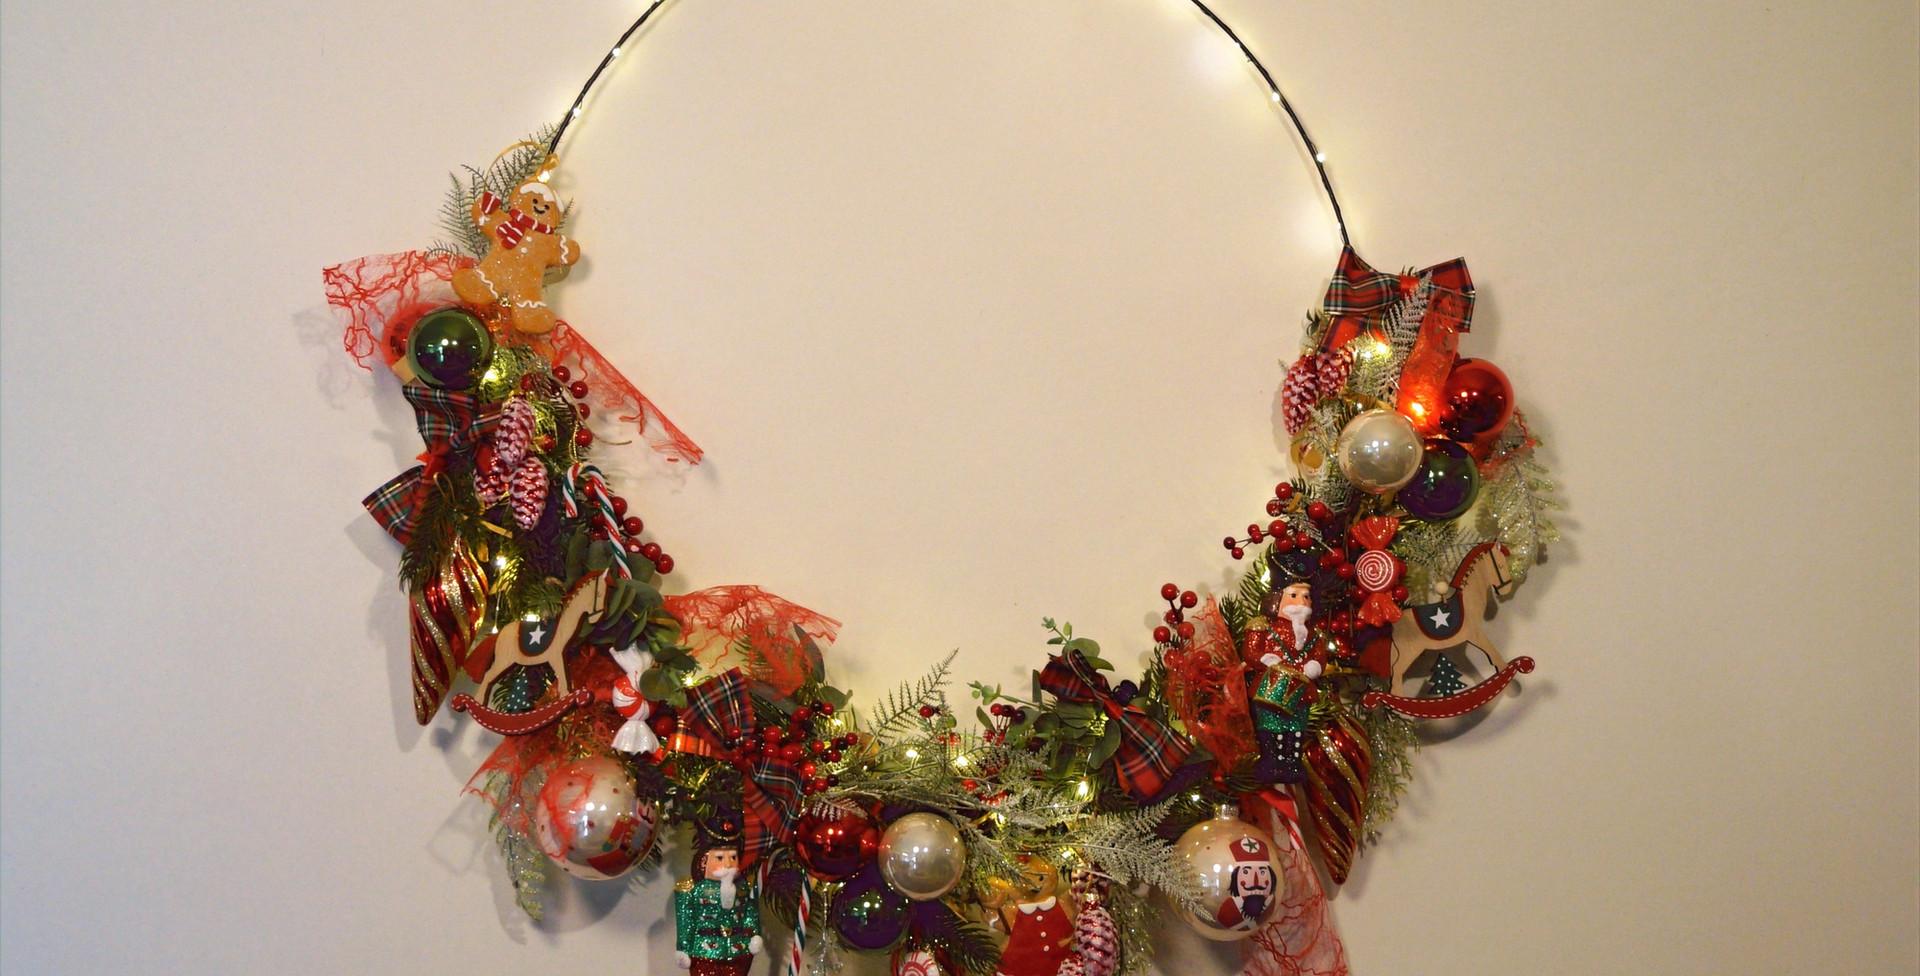 kersthoepel old school christmass